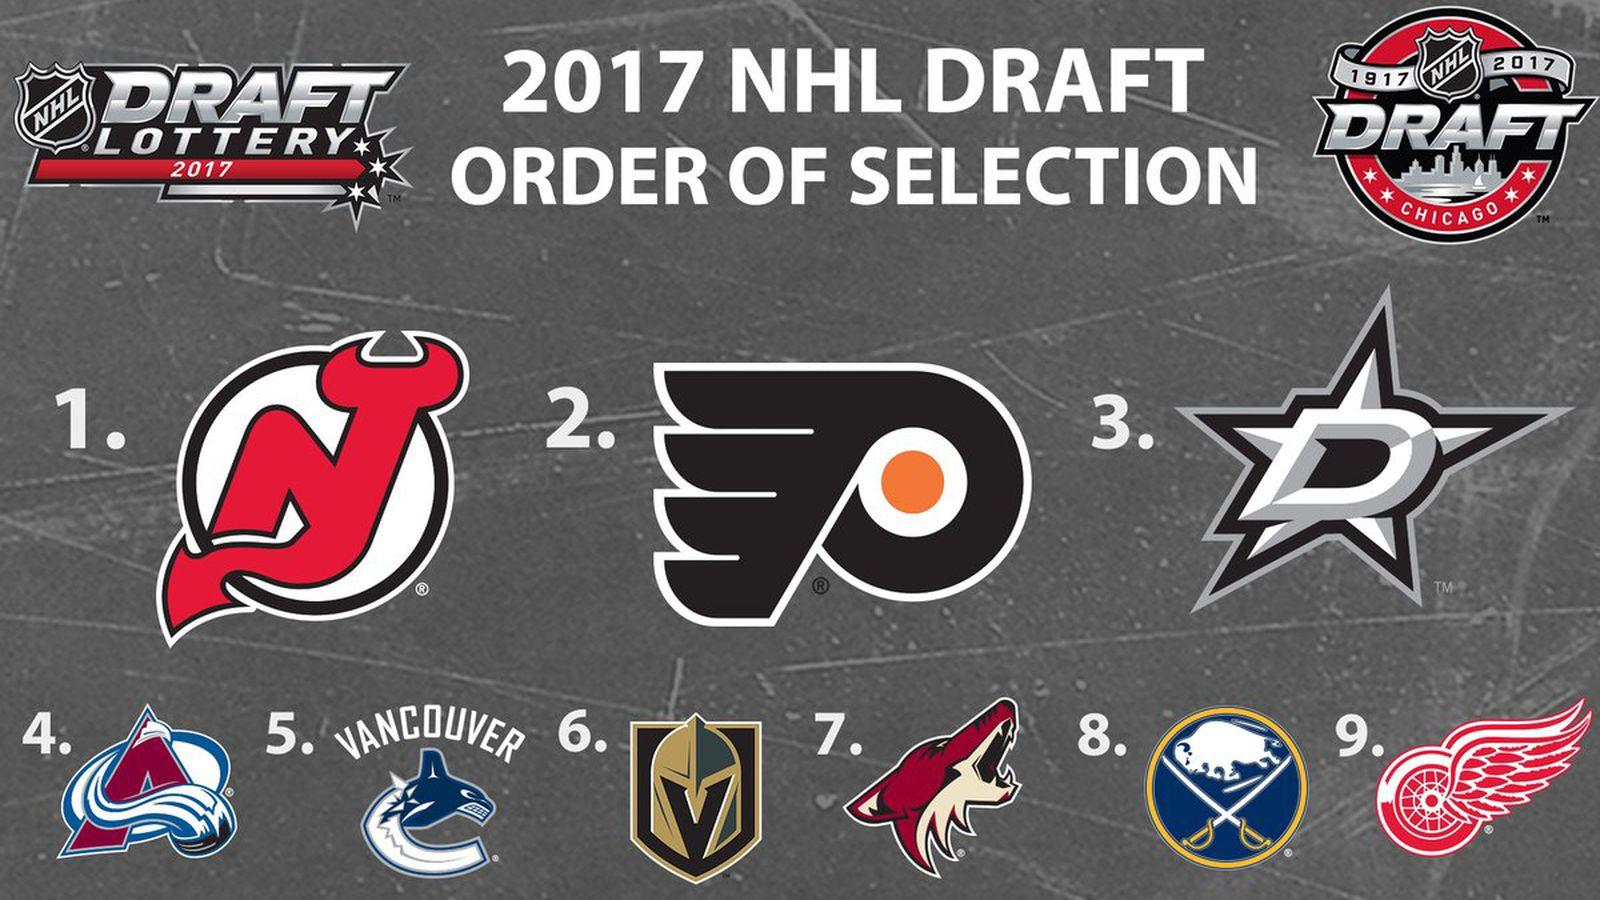 Draft_lottery_order.0